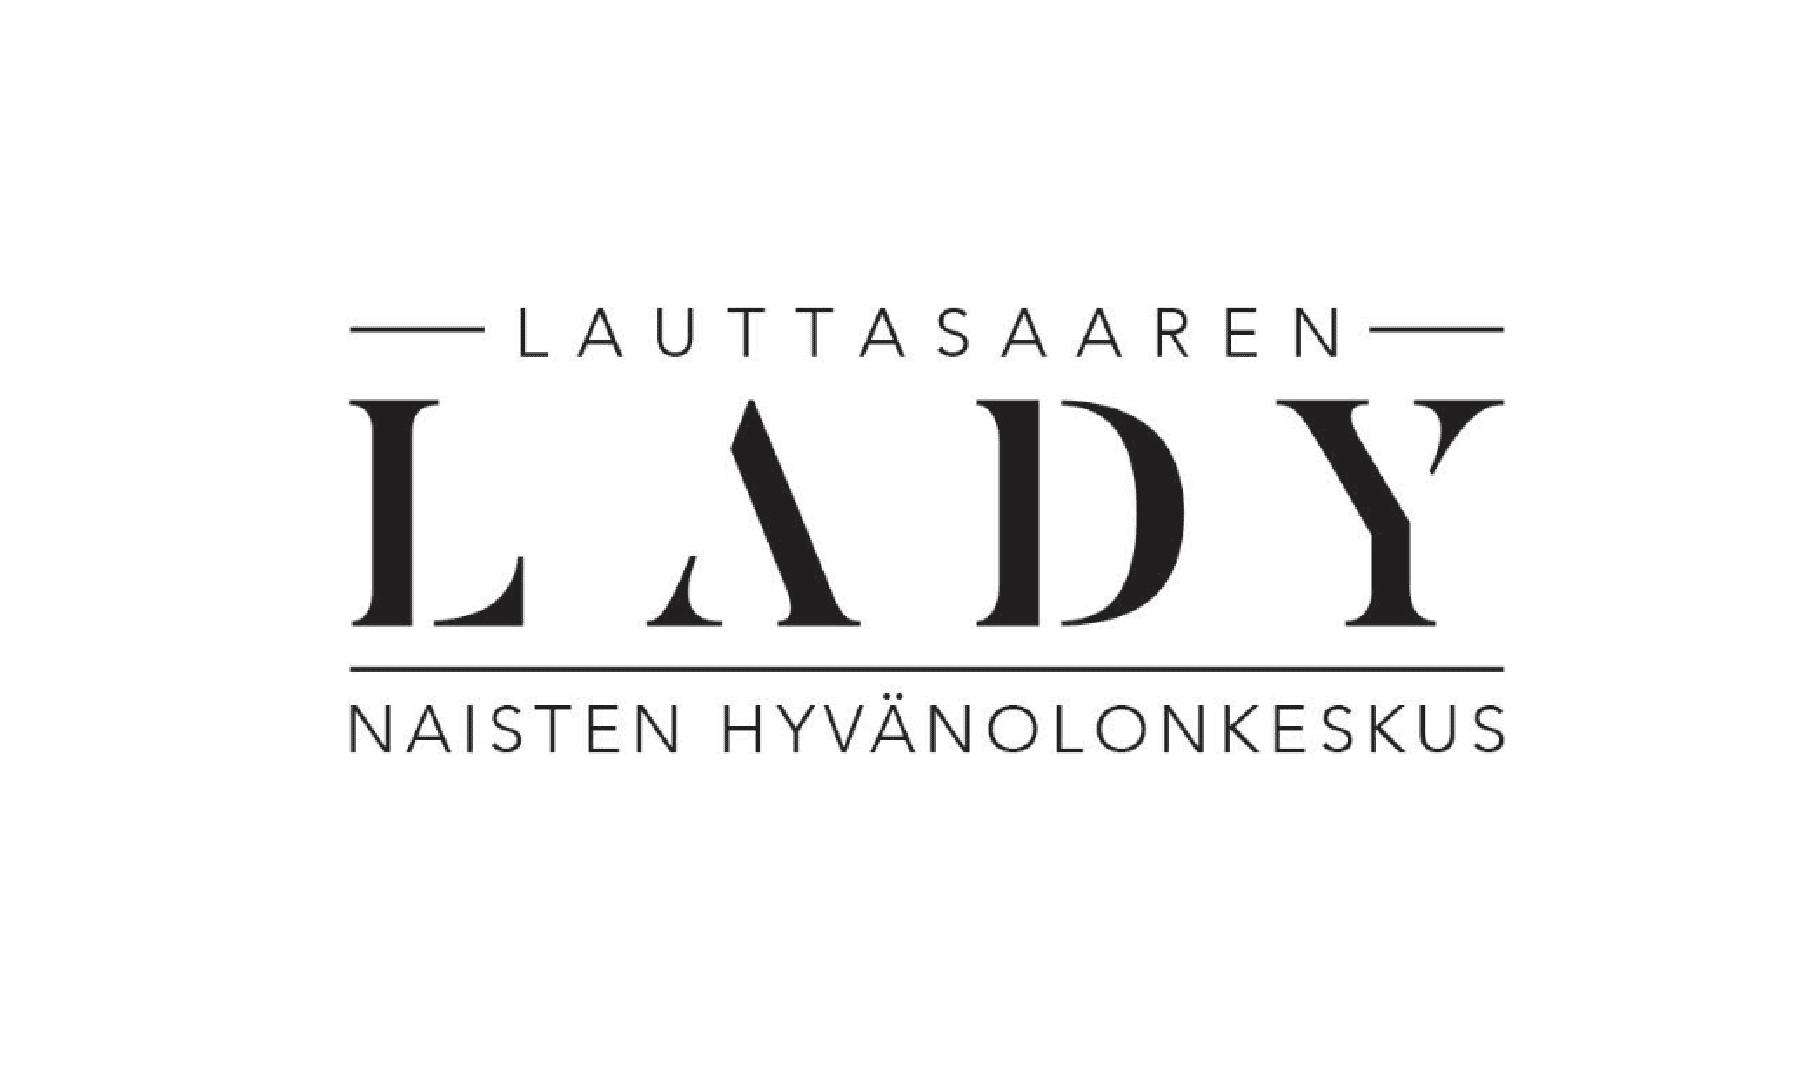 Lauttasaaren Lady